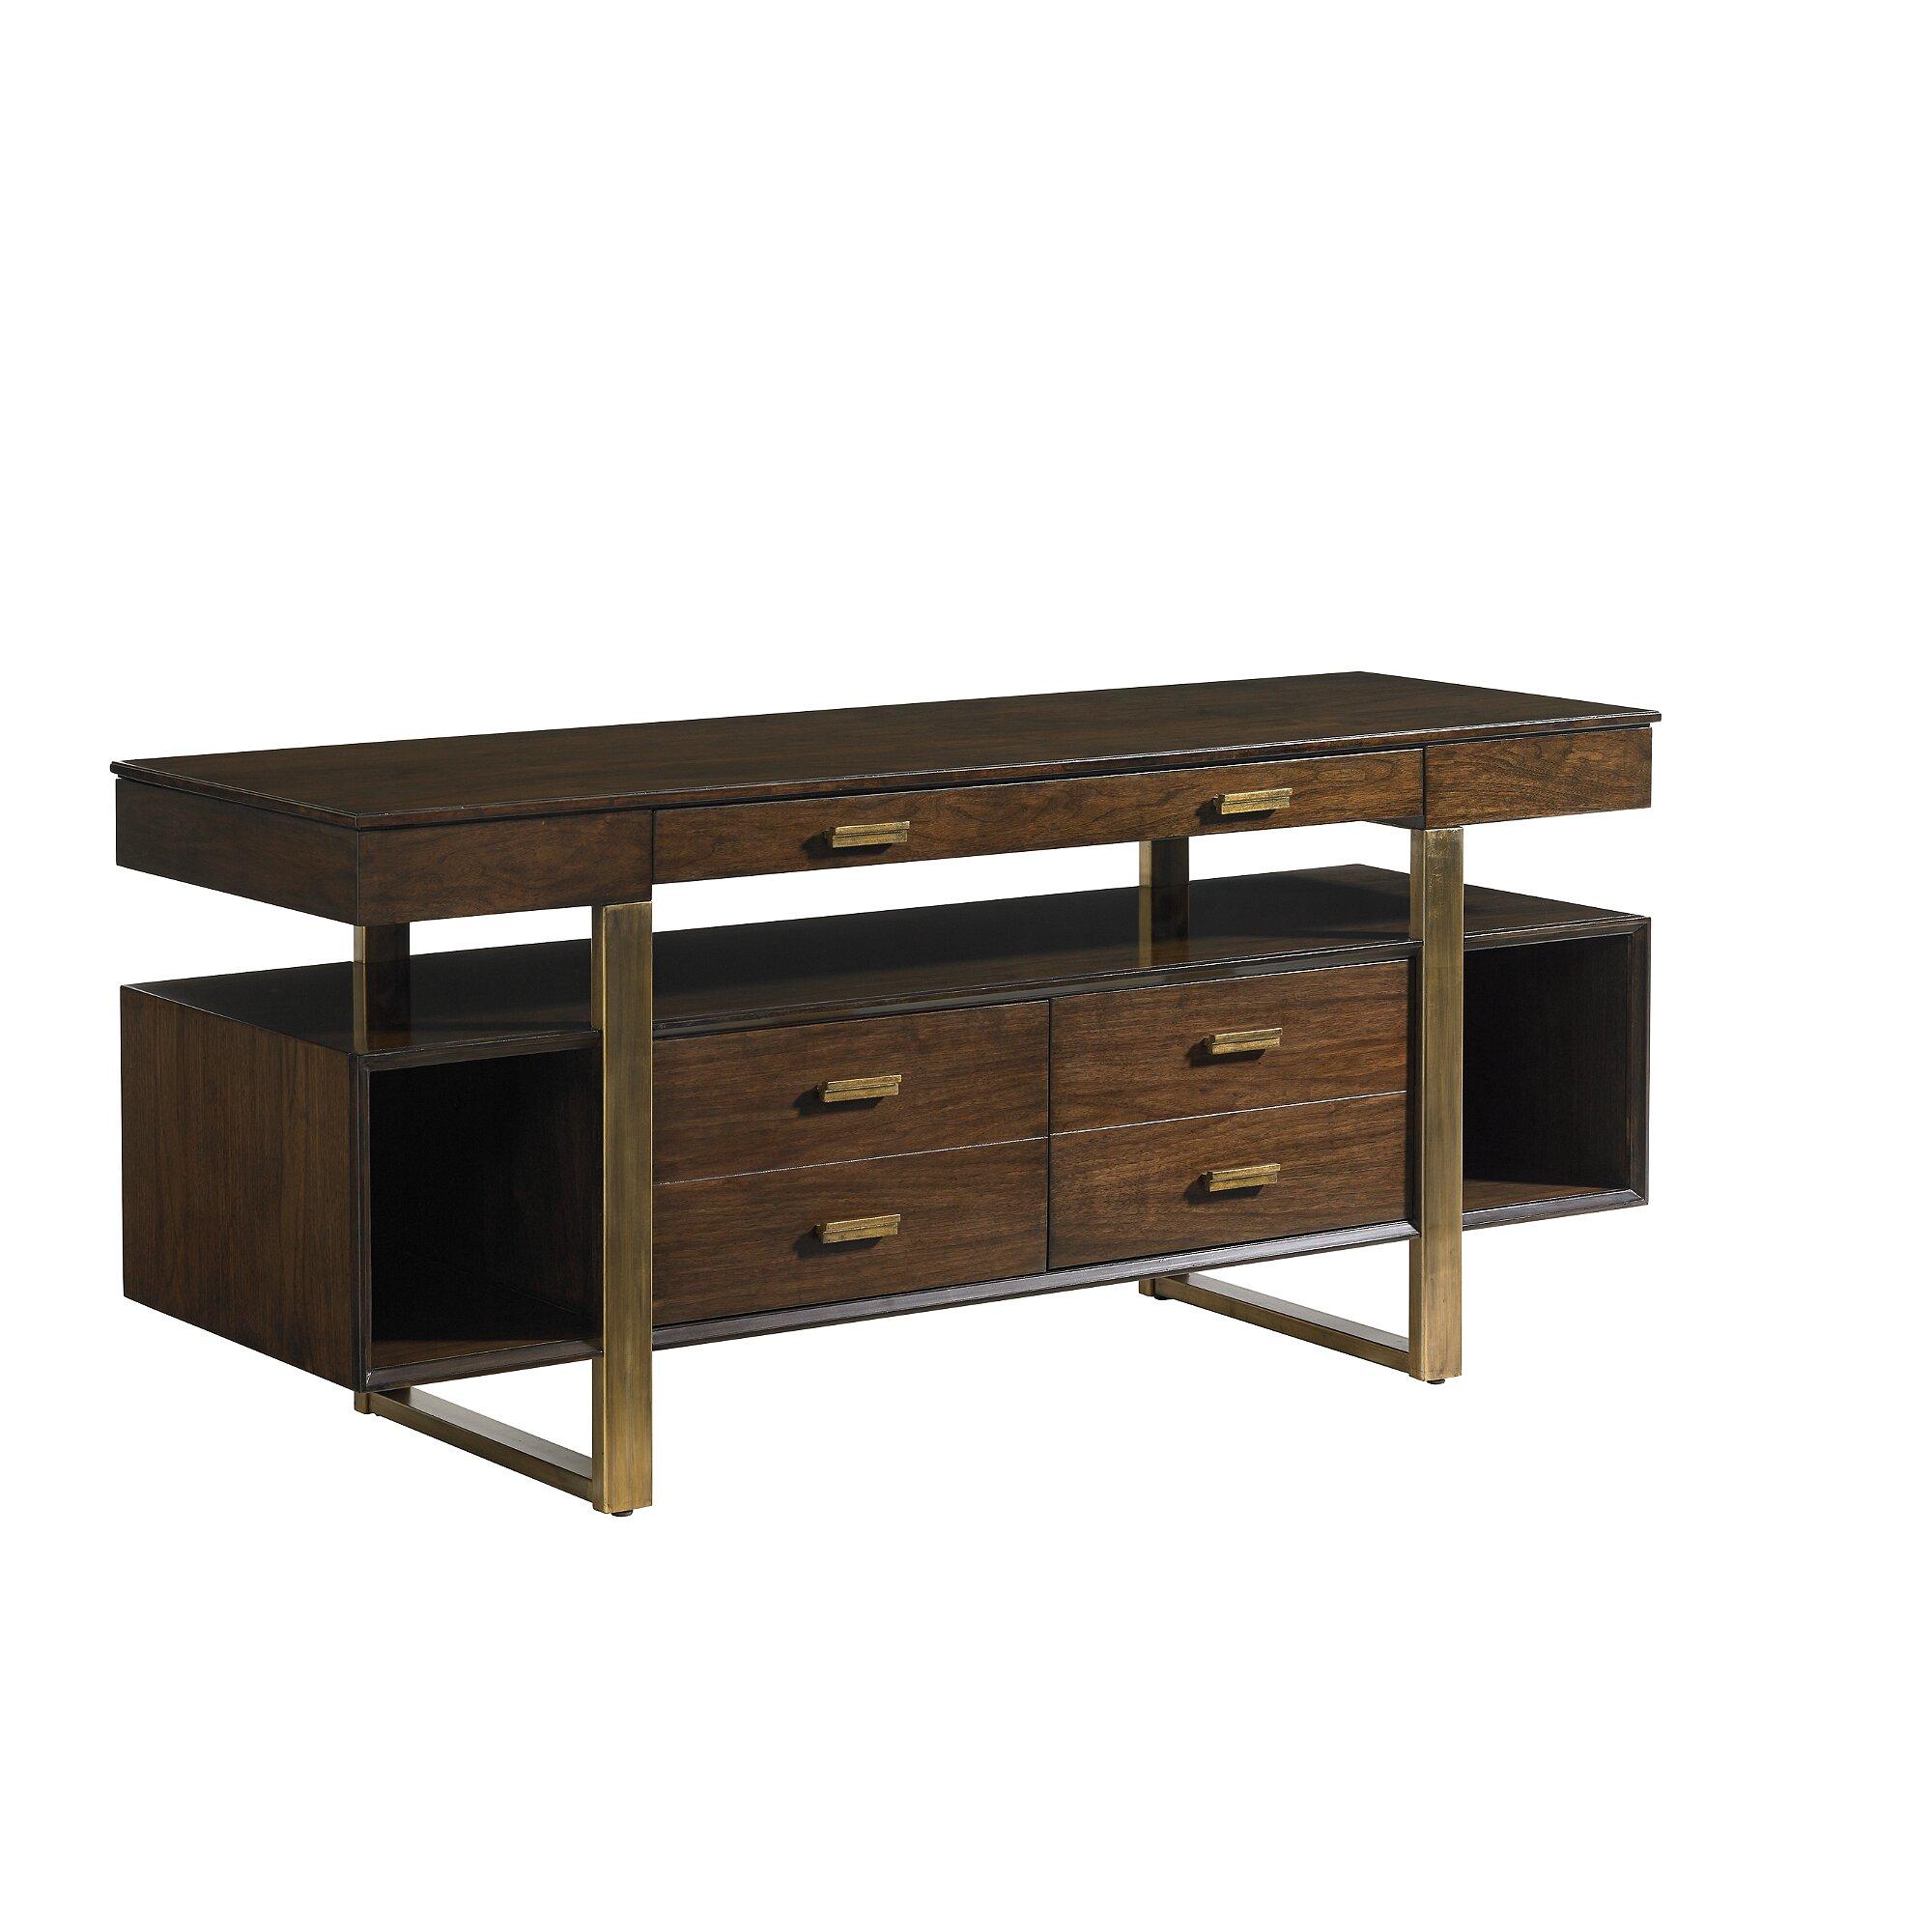 Stanley Kids Bedroom Furniture Stanley Crestaire Credenza Chest Amp Reviews Wayfair